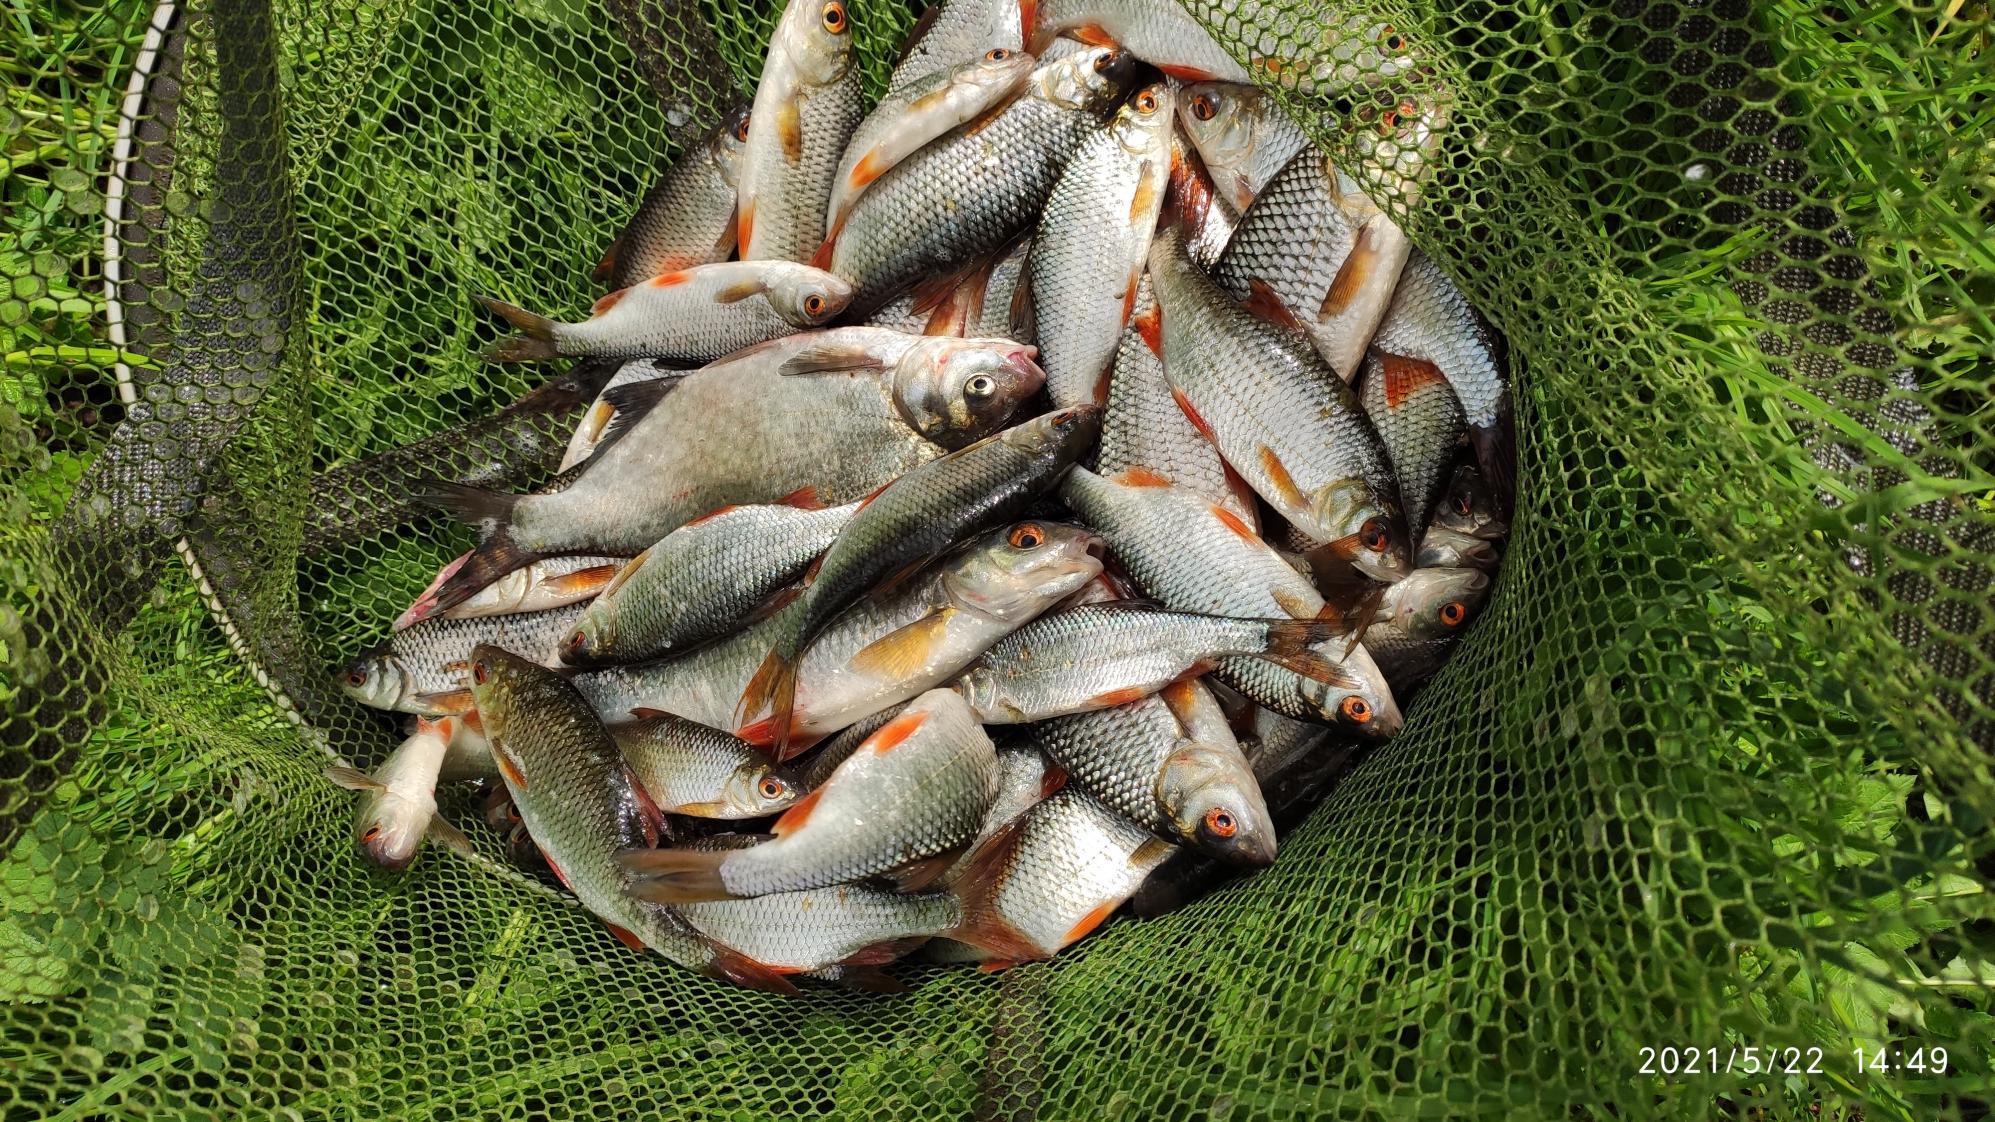 Был сегодня, мах 5м, ловил с 7 до ... | Отчеты о рыбалке в Беларуси